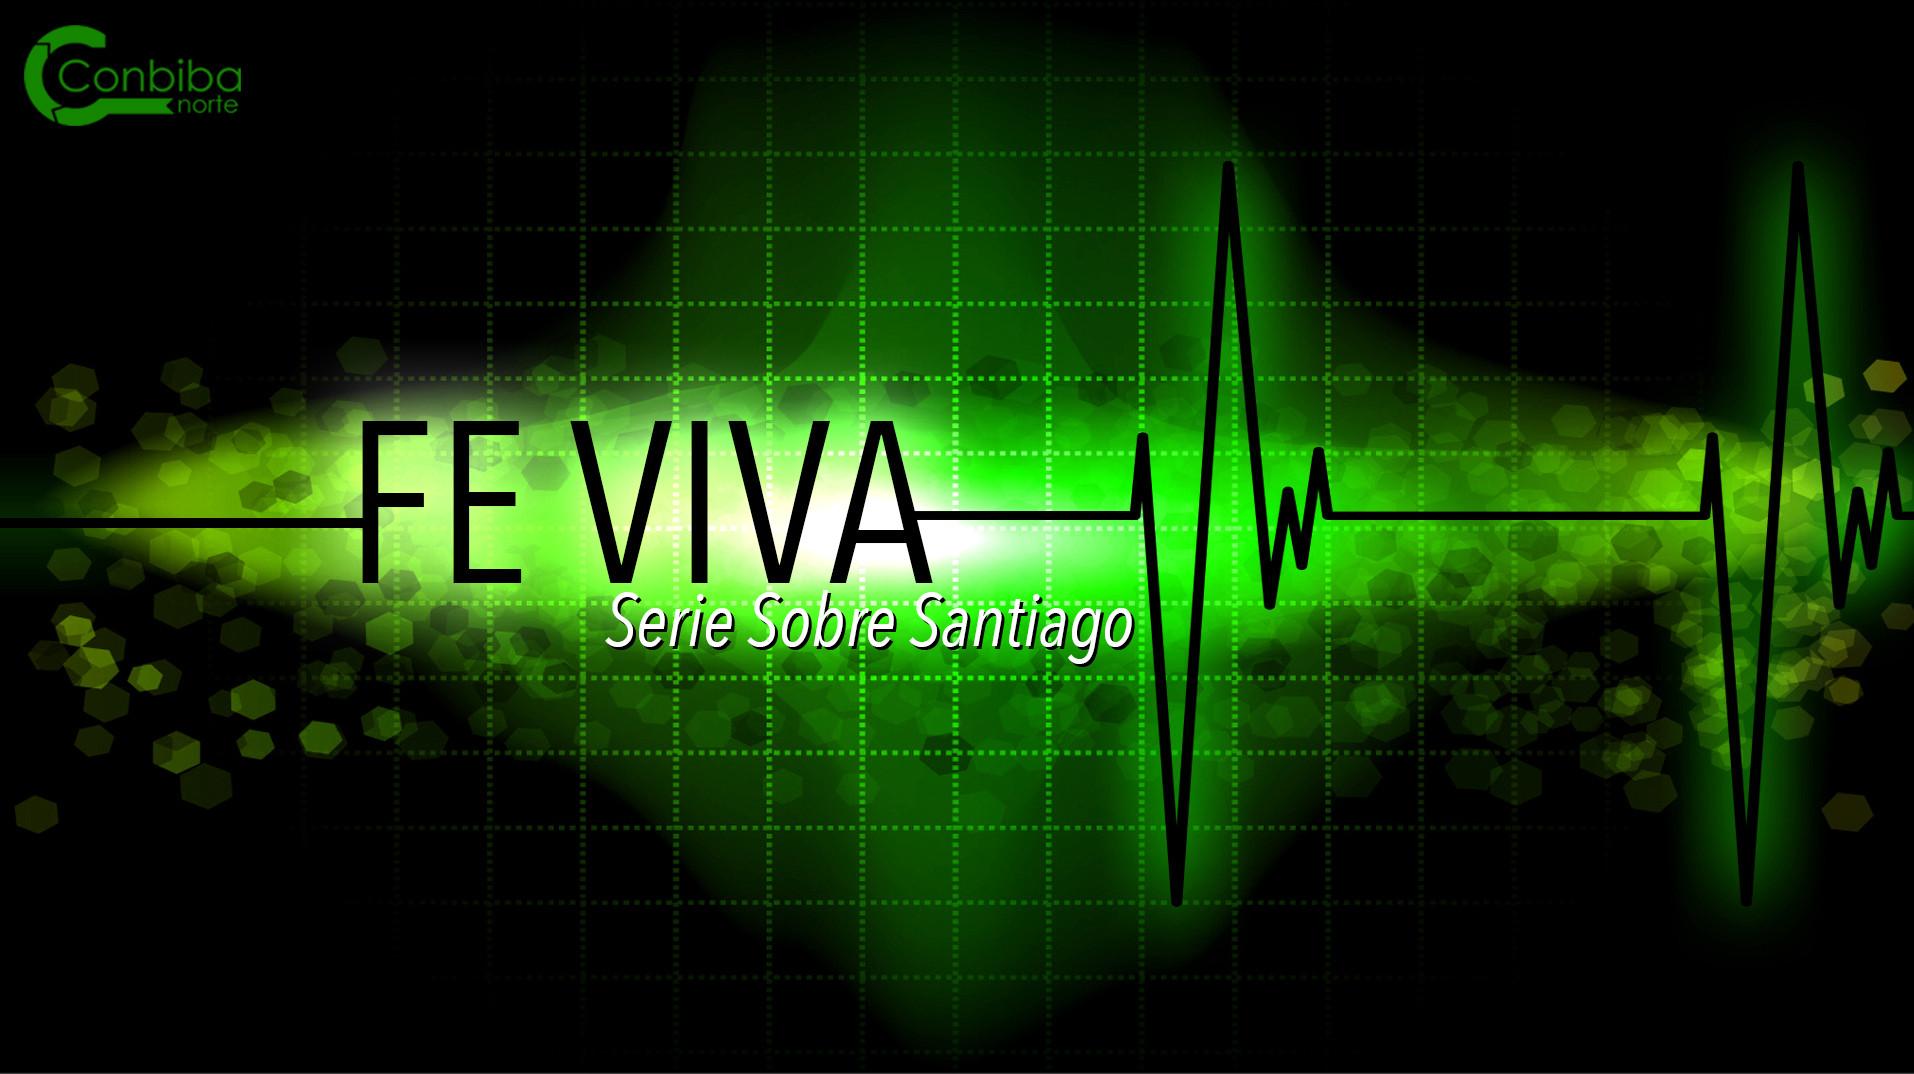 Fe_Viva-Title_HD.jpg